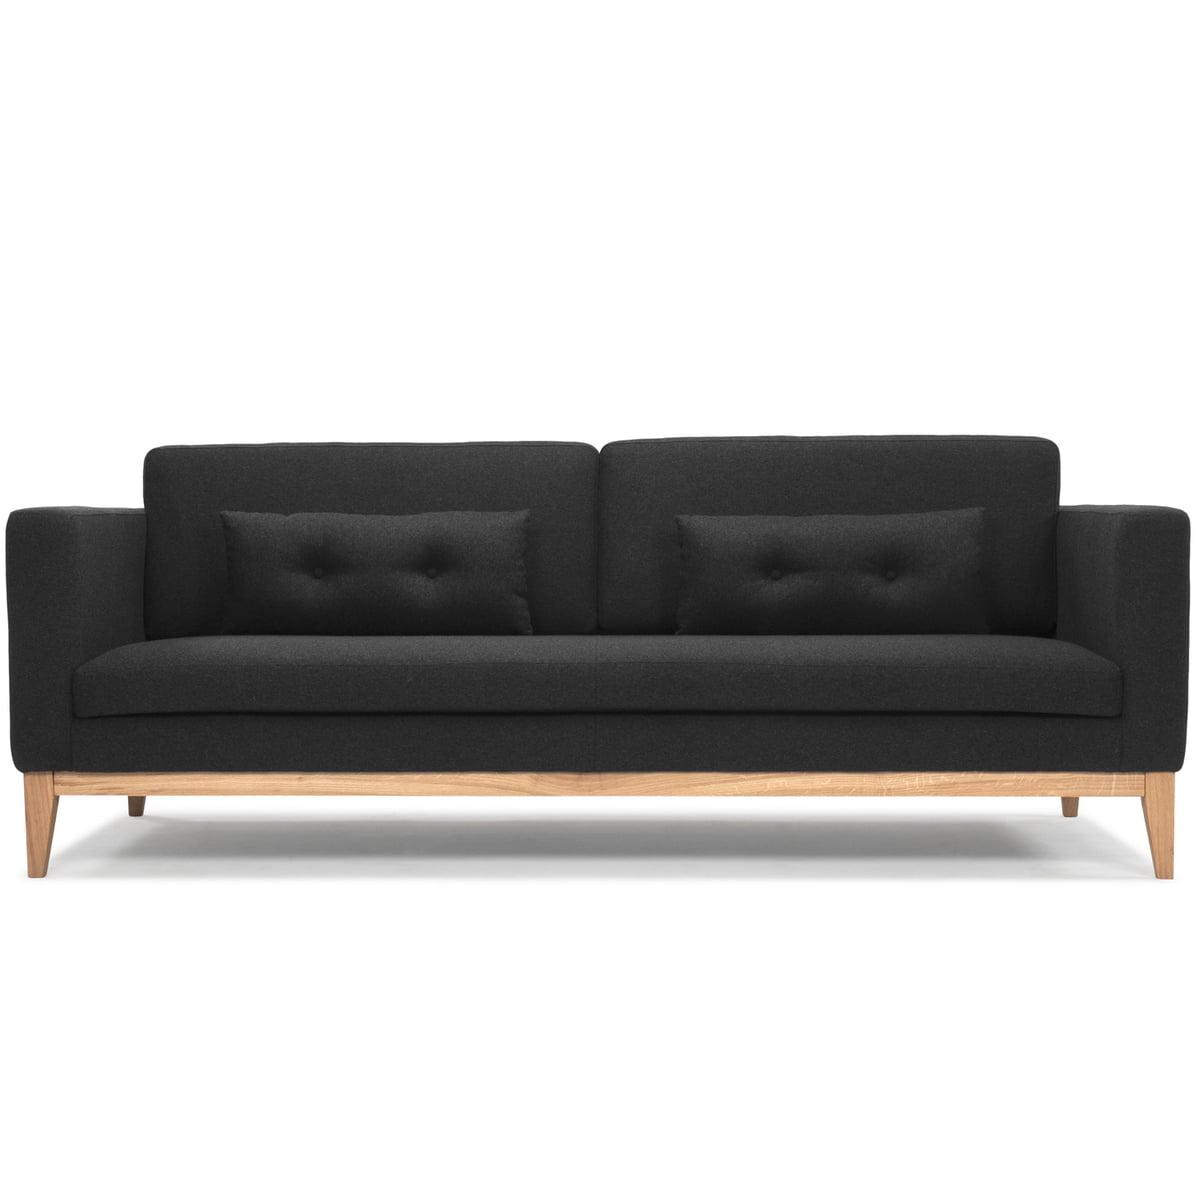 day sofa von design house stockholm online kaufen. Black Bedroom Furniture Sets. Home Design Ideas